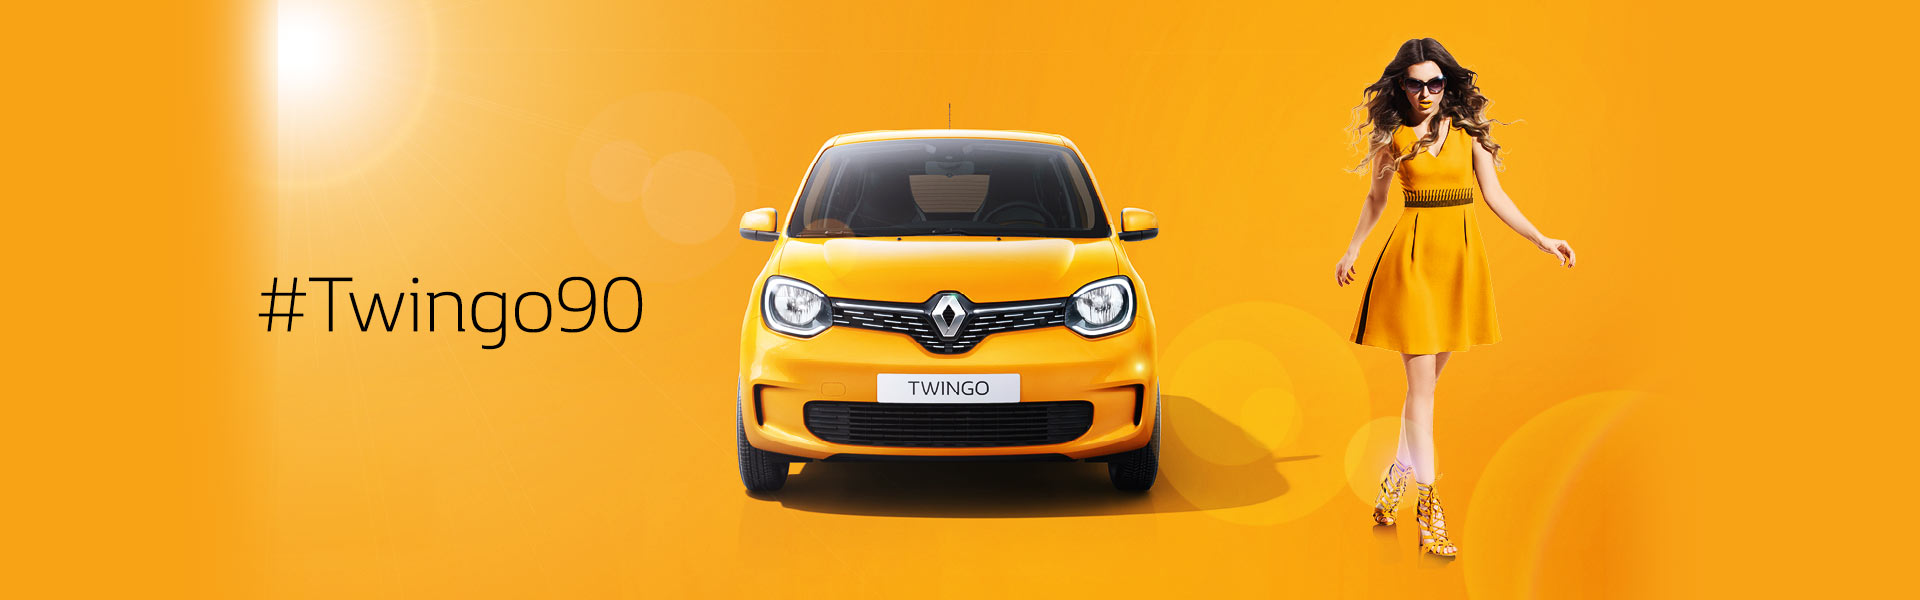 Twingo90